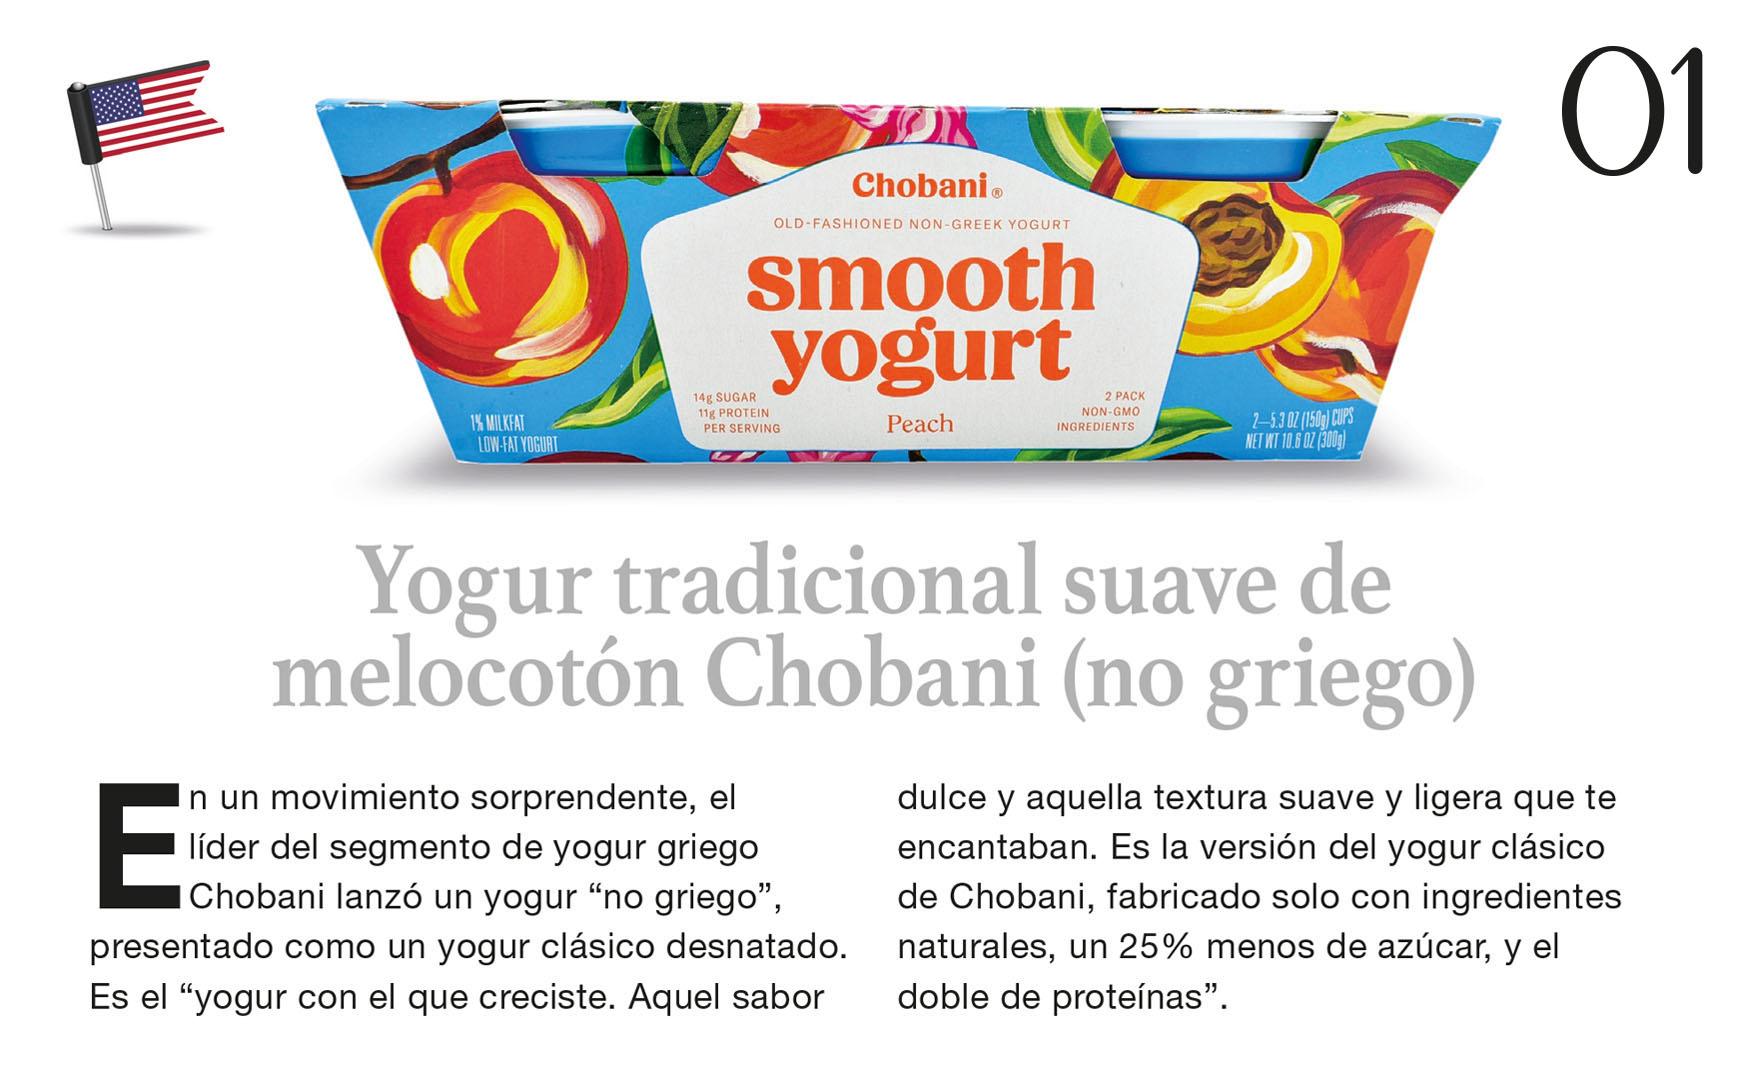 Yogur tradicional suave de melocotón Chobani (no griego)